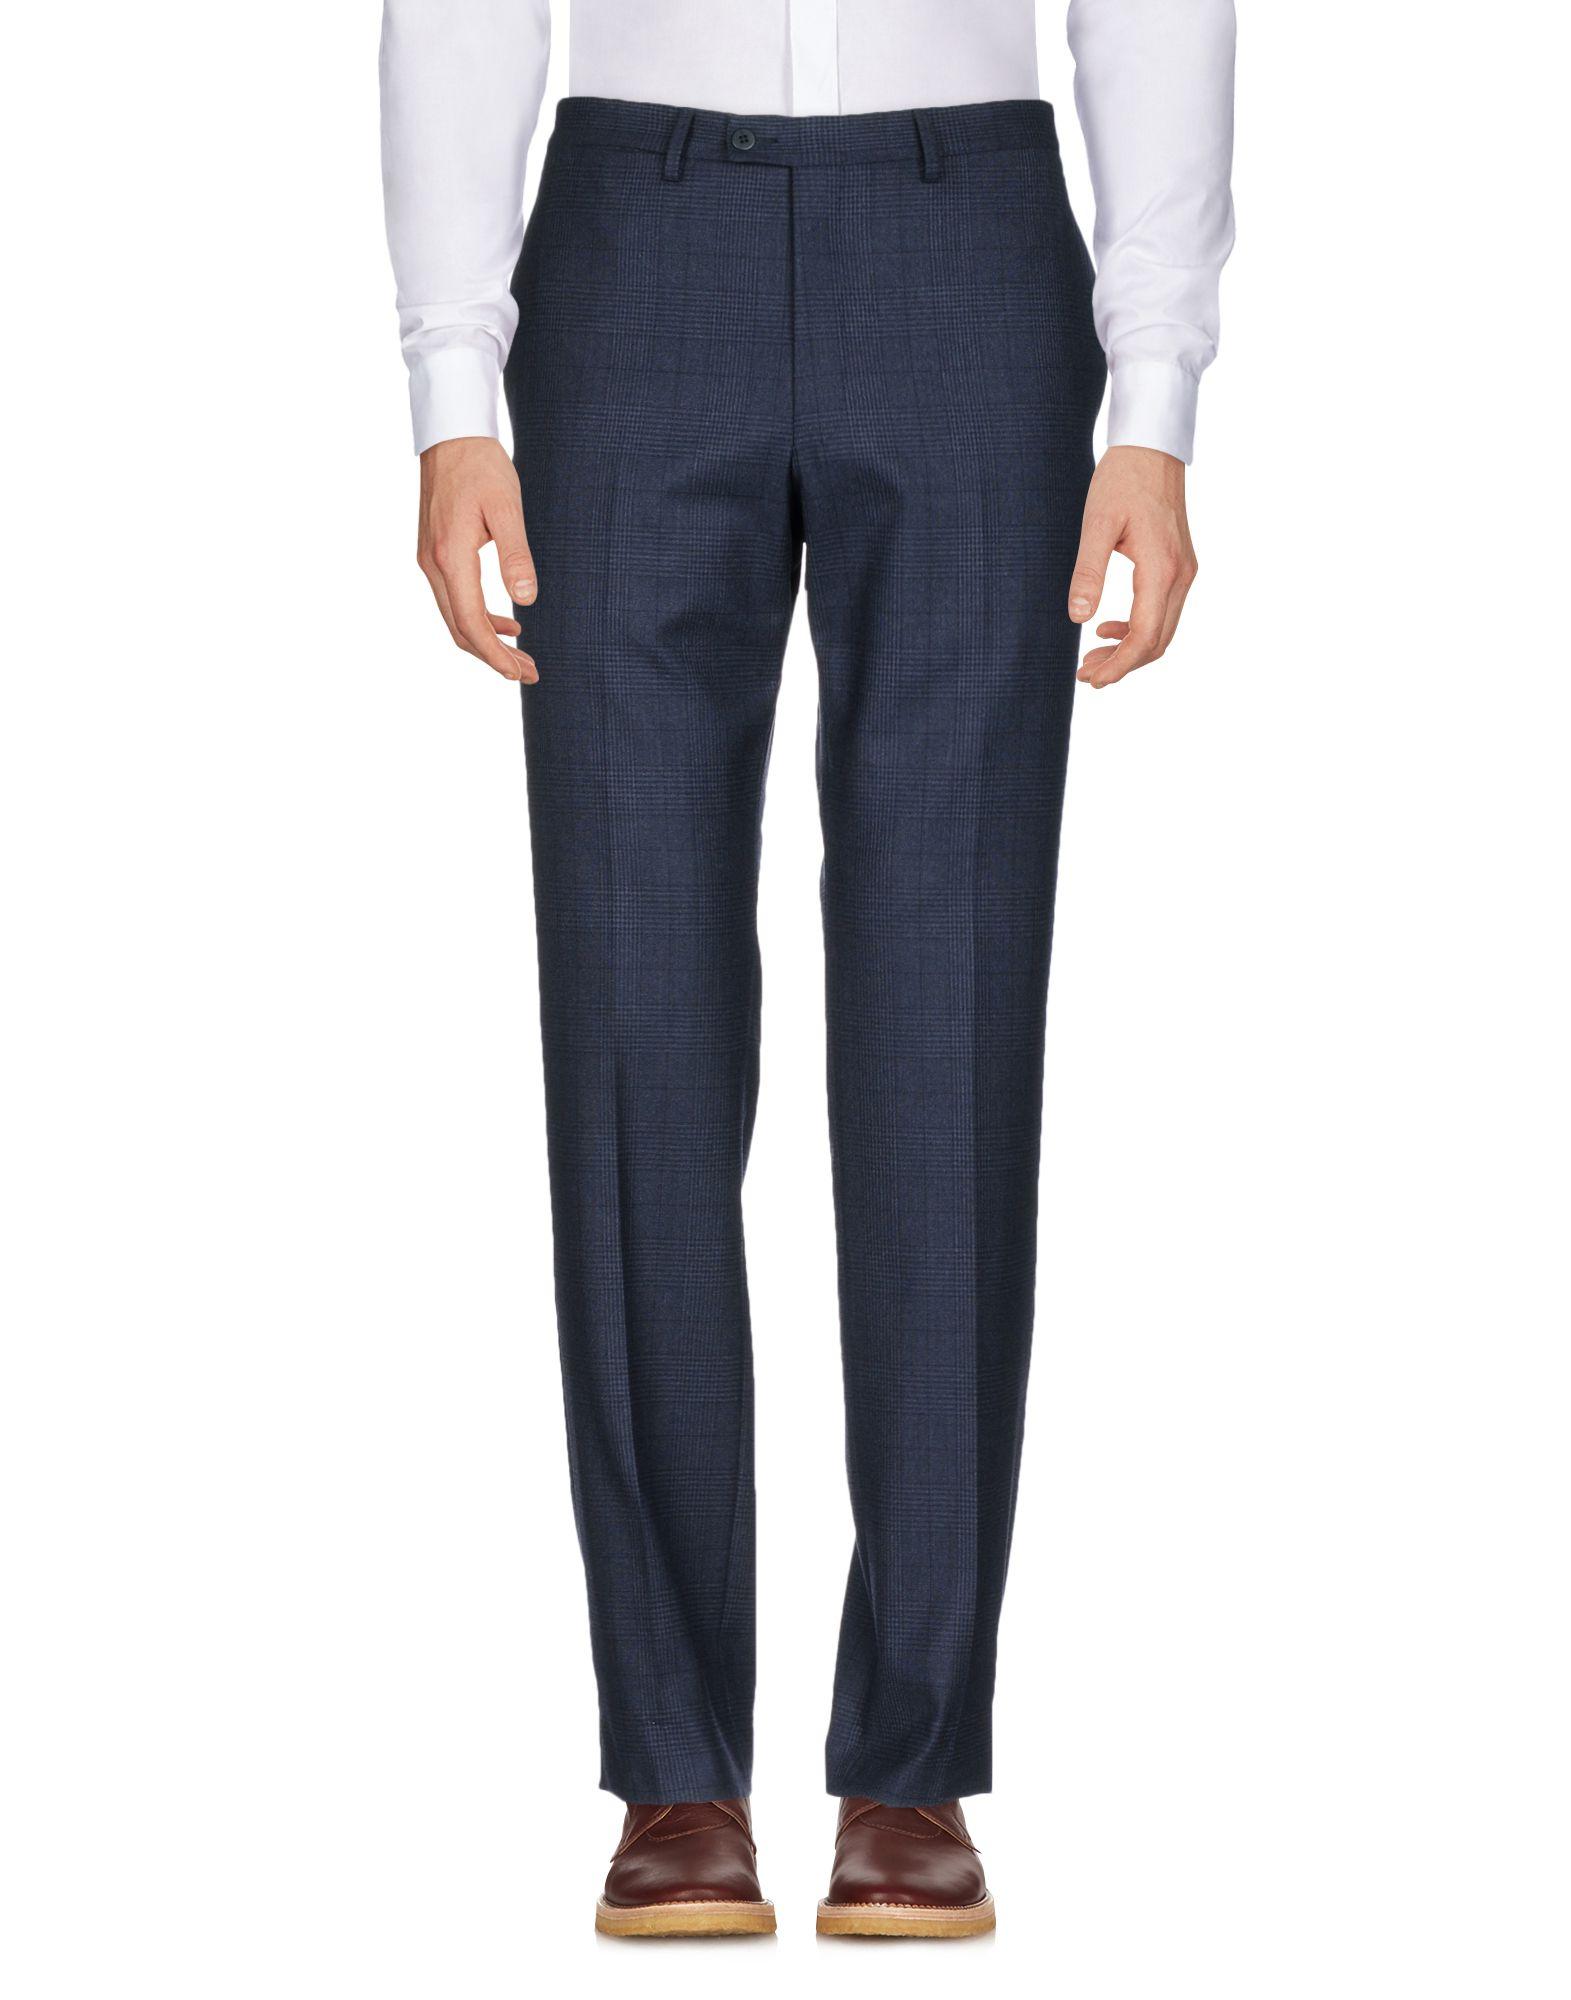 Pantalone Sartorio Uomo - Acquista online su